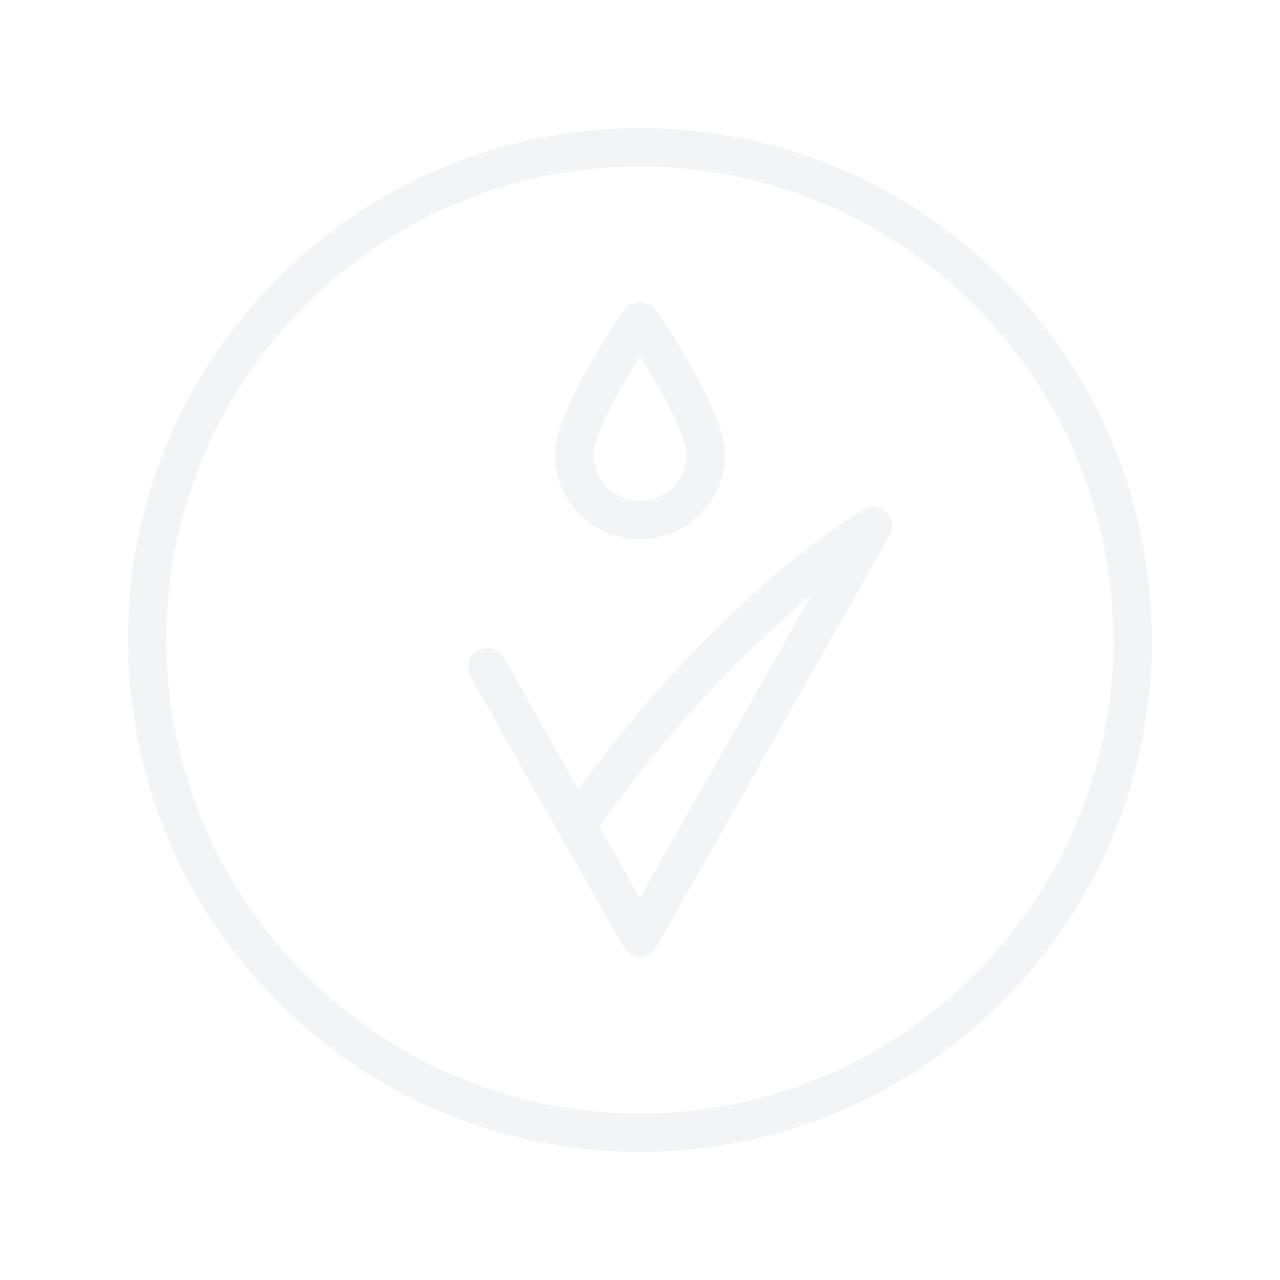 WHAMISA Organic Fruits Lip Moisture 4g